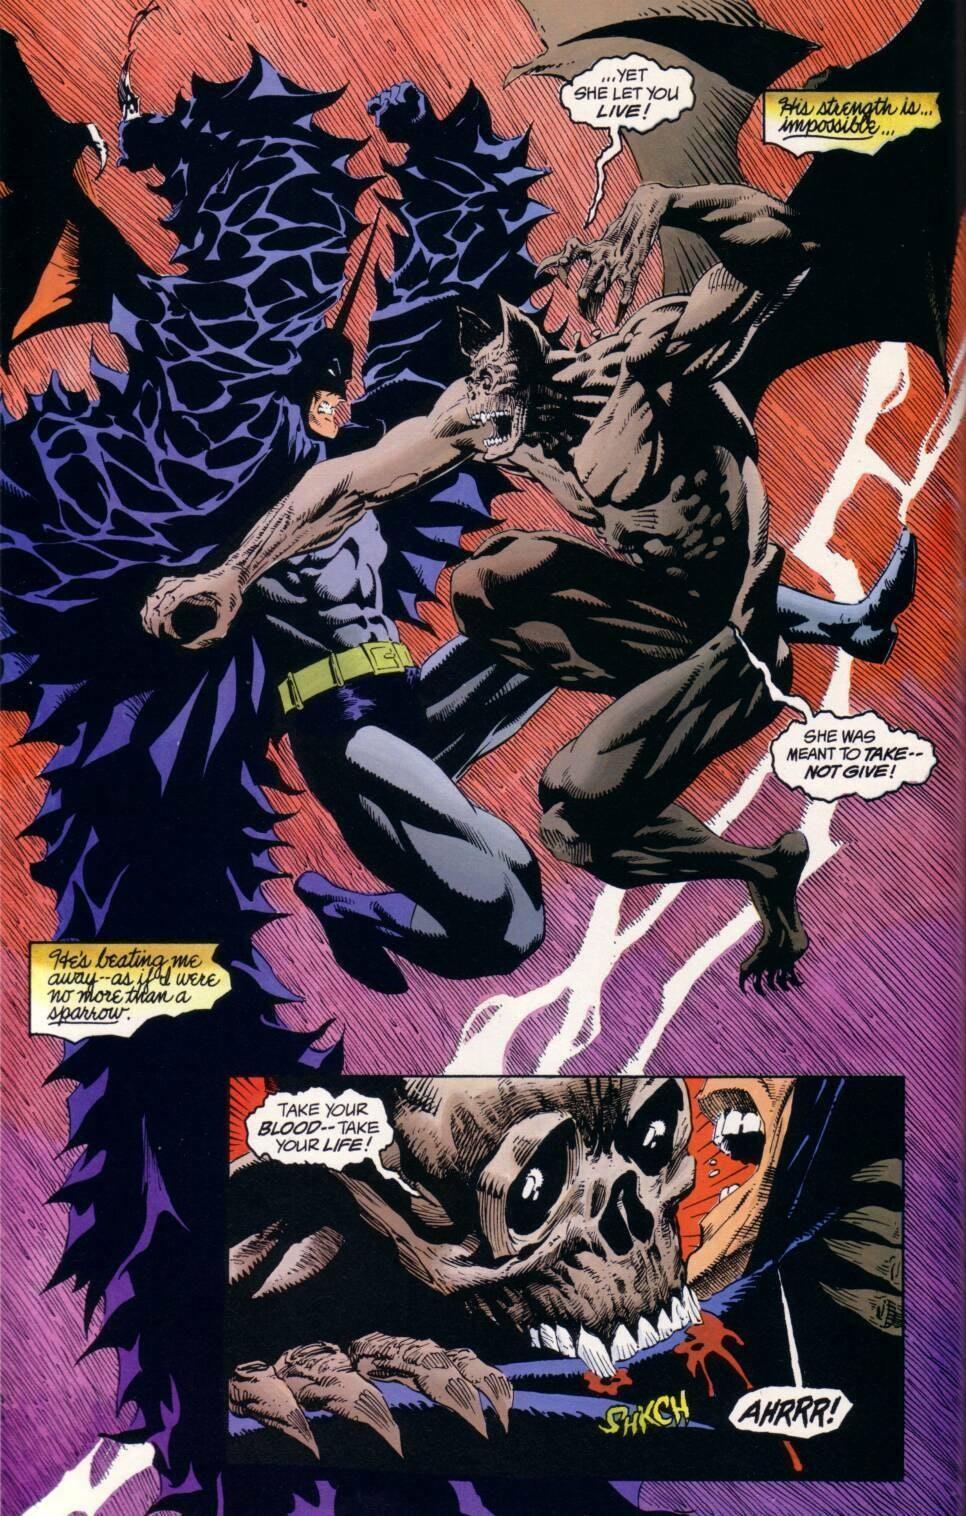 Batman and Dracula